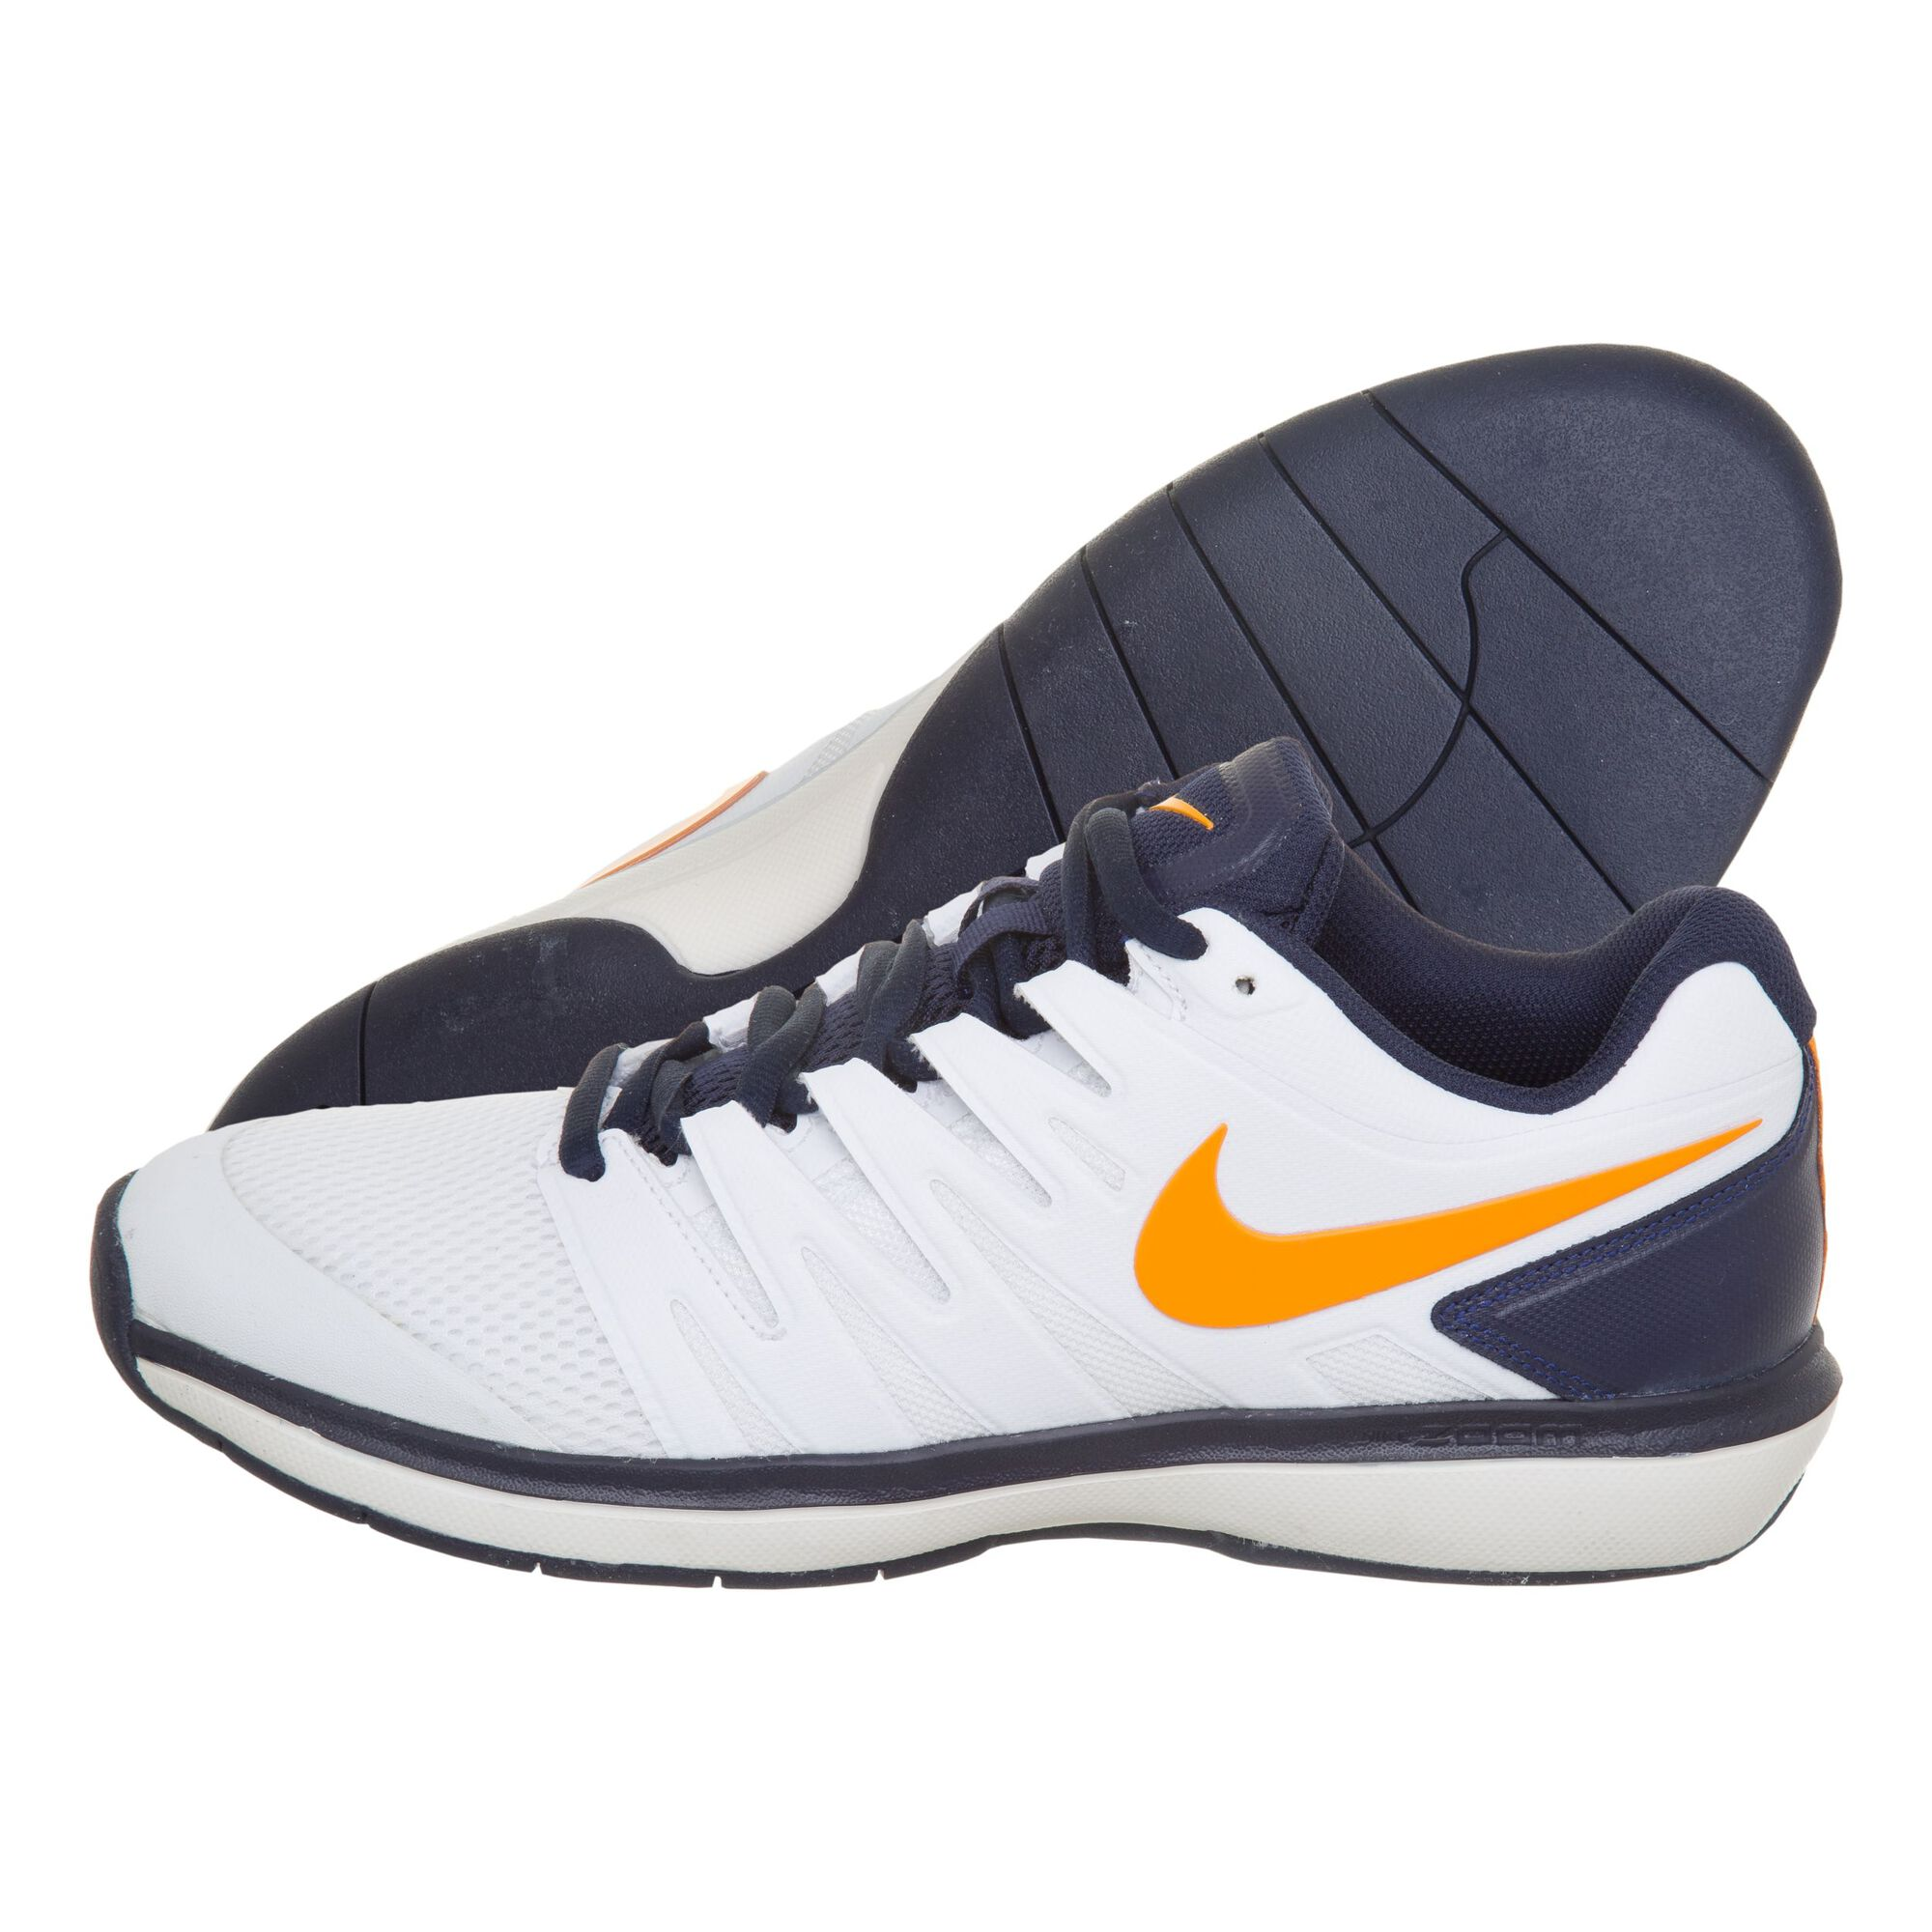 d144a49338bdf Nike Air Zoom Prestige Carpet Teppichschuh Herren - Weiß, Dunkelblau ...